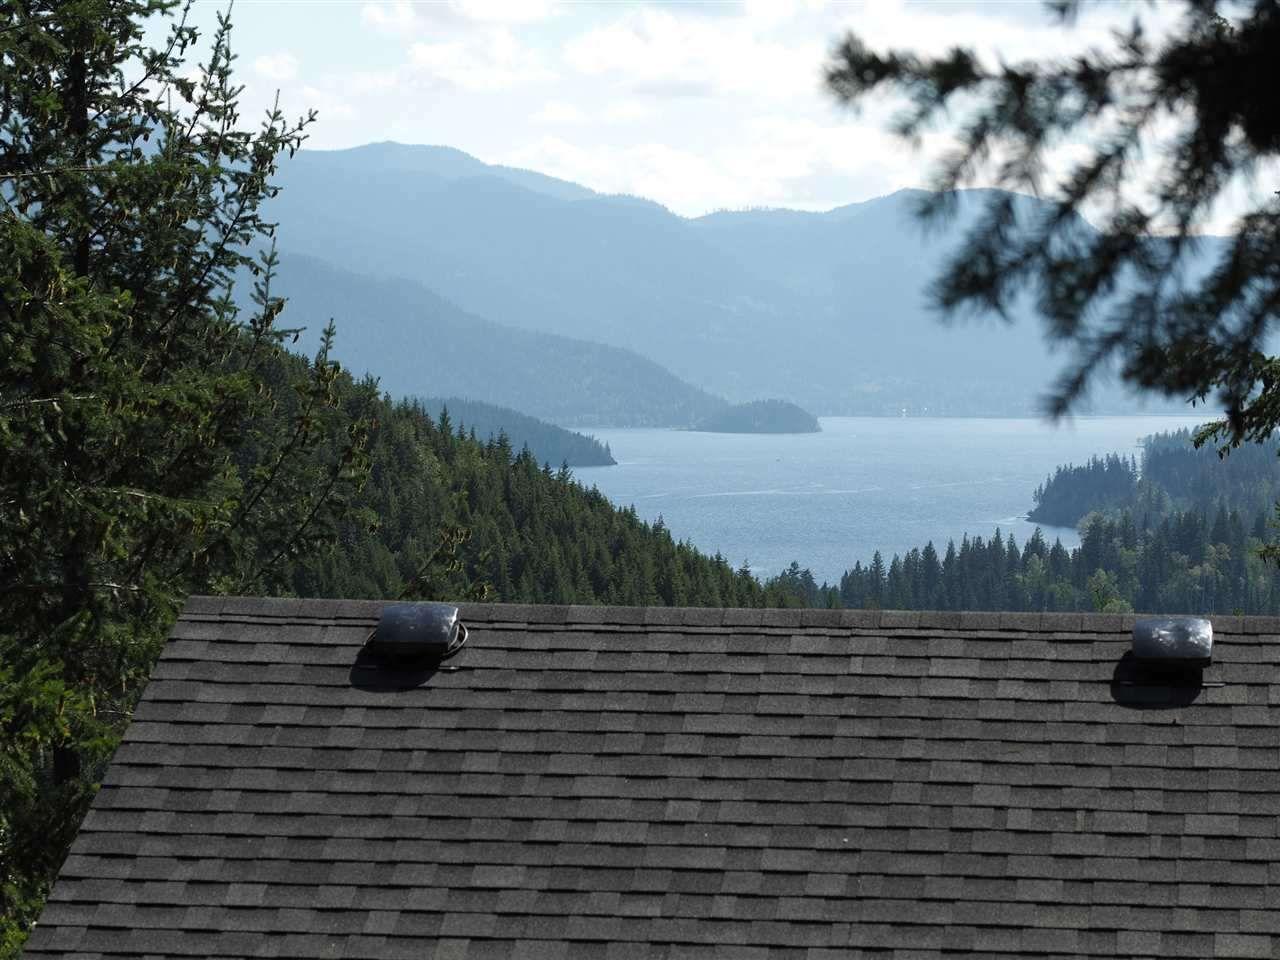 Main Photo: 3368 HENDRIX Road in Canim Lake: Canim/Mahood Lake House for sale (100 Mile House (Zone 10))  : MLS®# R2435282